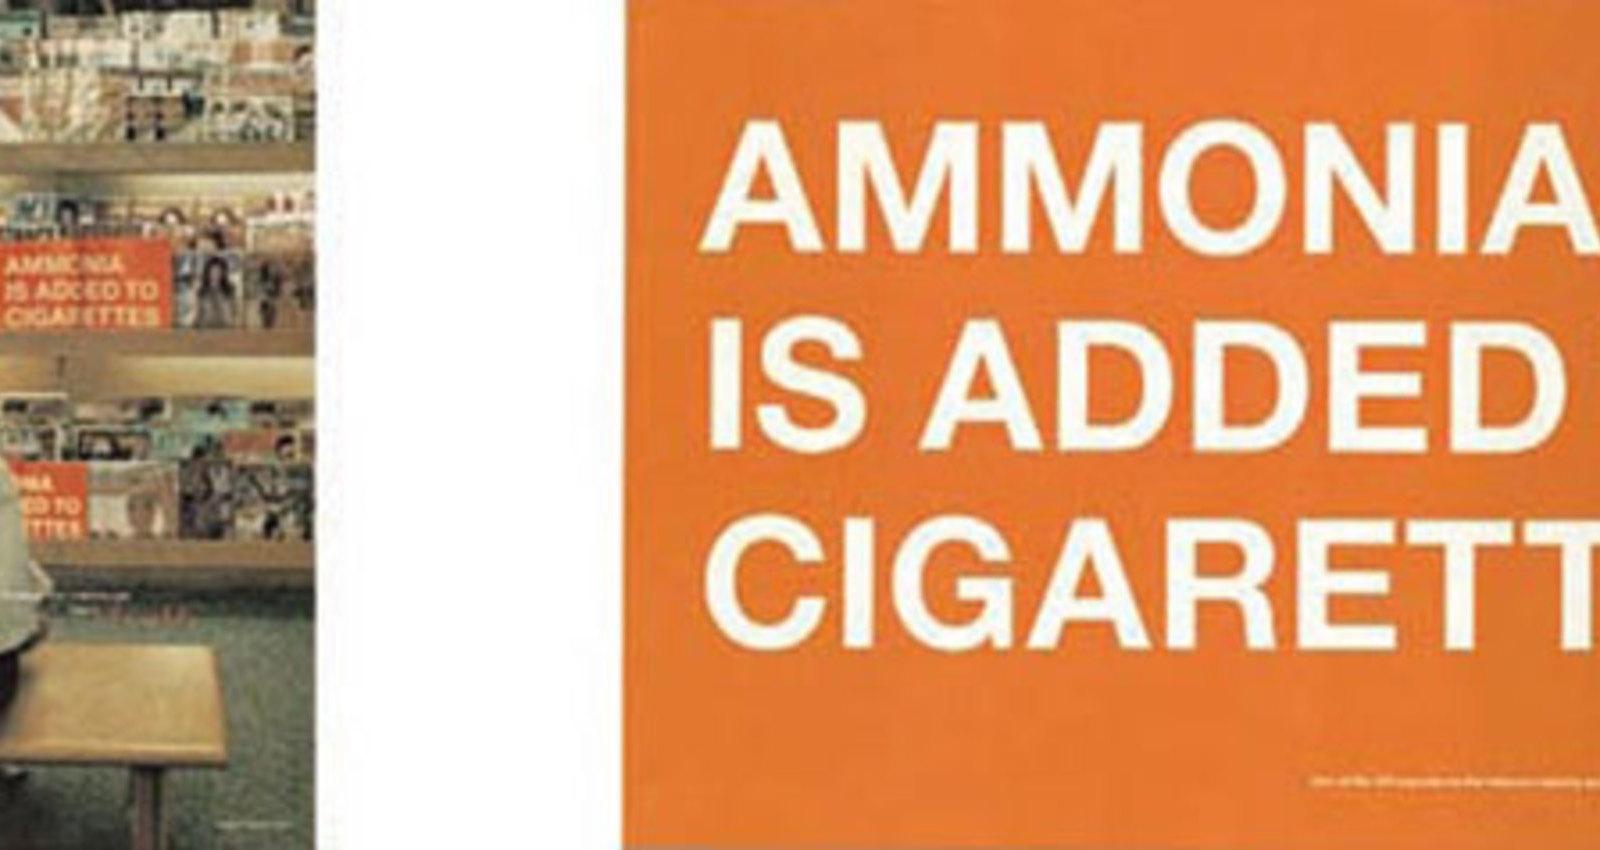 Arsenic, Ammonia, Cyanide